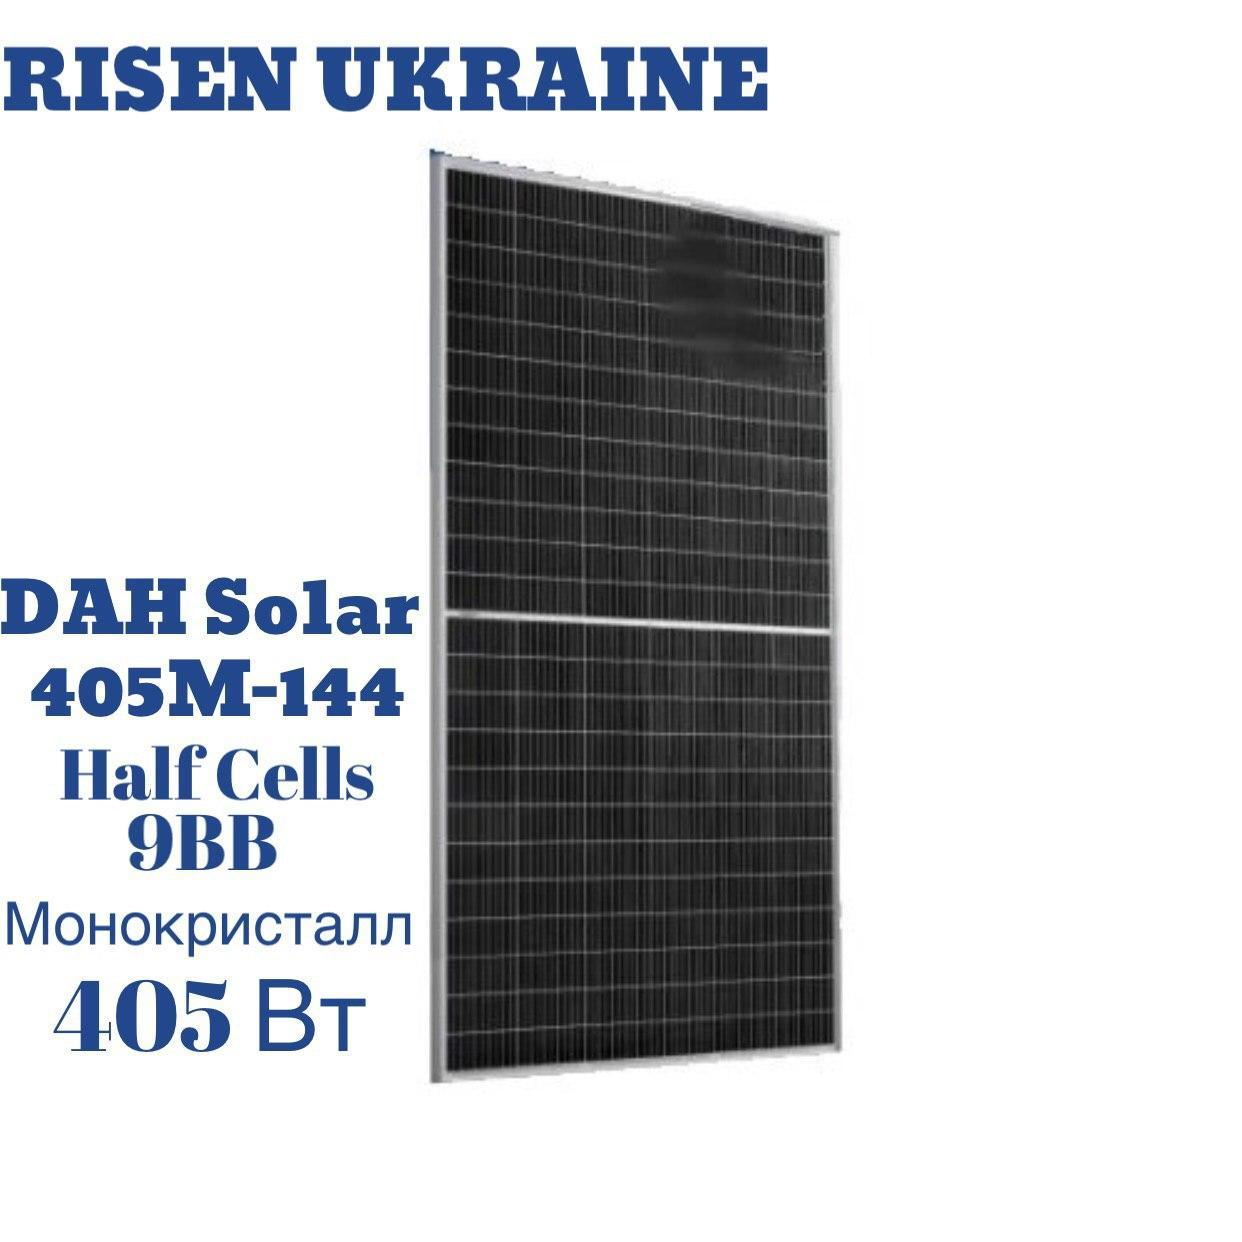 Солнечная батарея DAH Solar Half-Cell HCM72X9, 405 Вт, 9 ВВ, 144 CELL